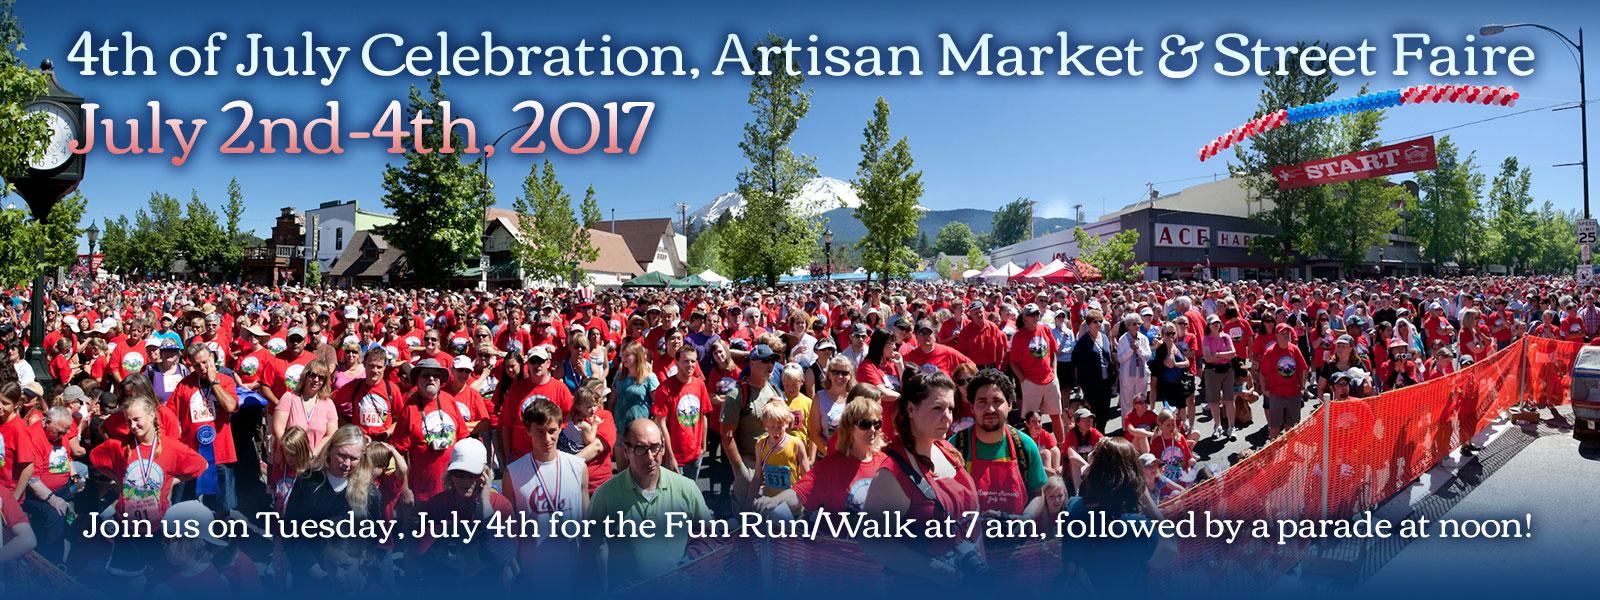 4th of July Celebration, Artisan Market & Street Faire